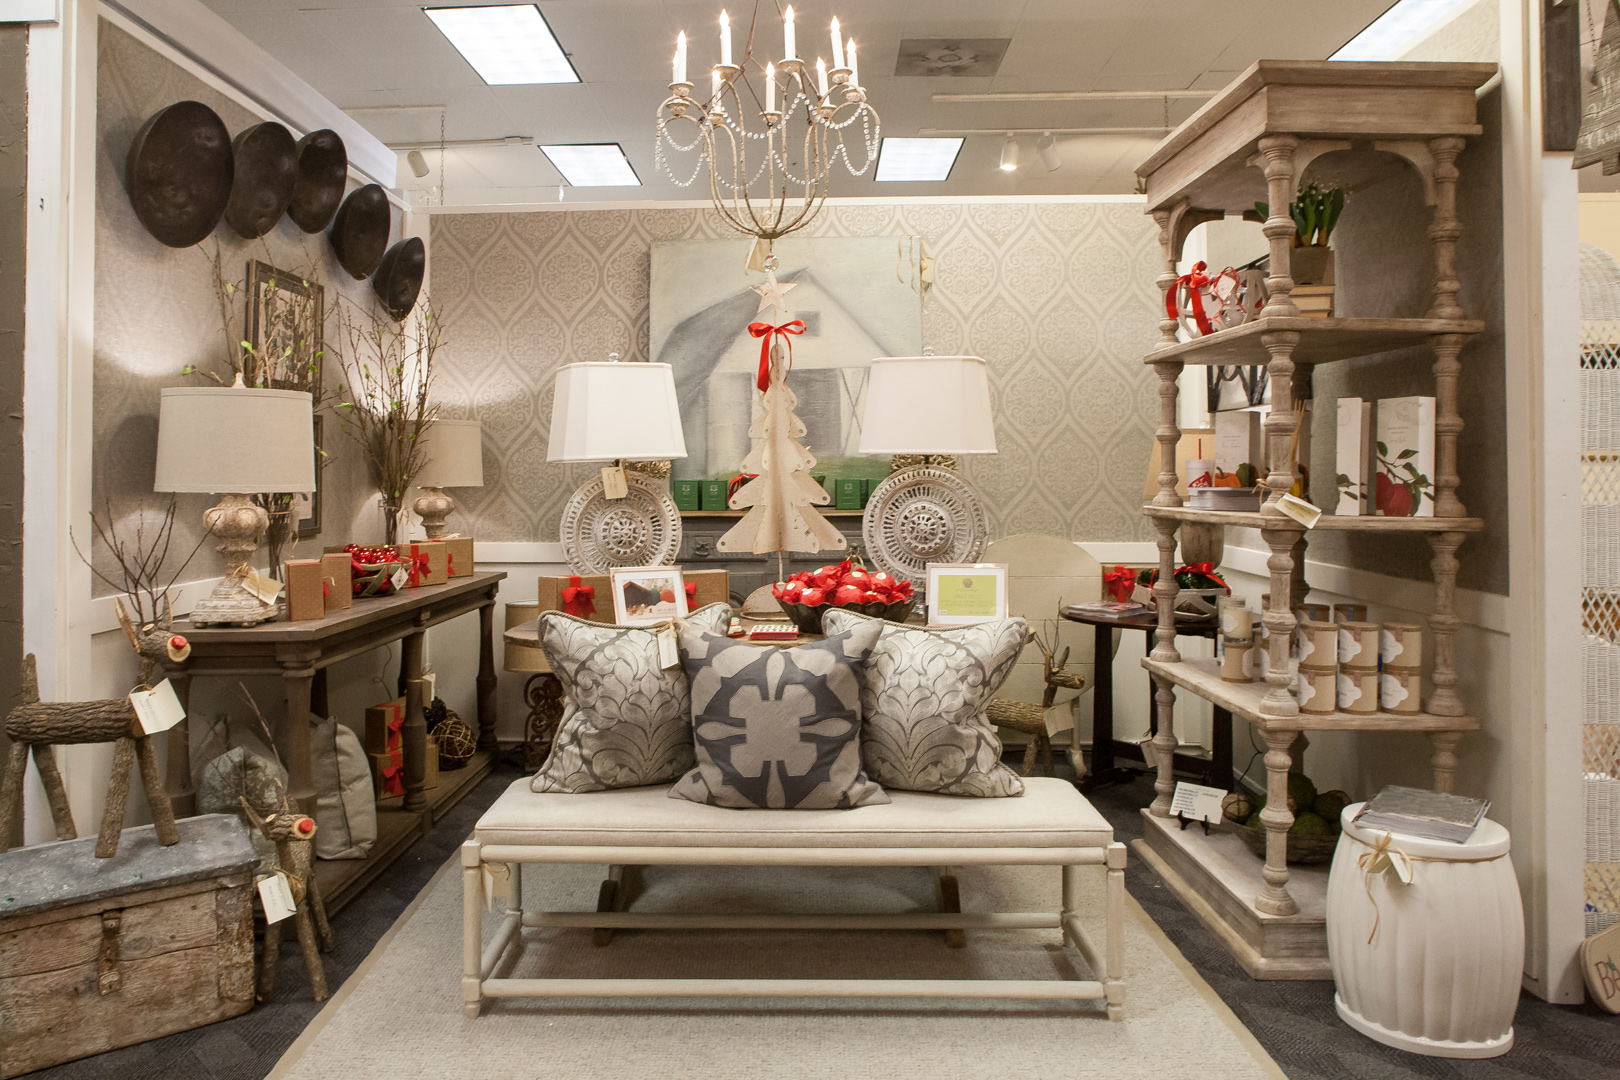 Cindy-McCord-Design-Retail-01.jpg